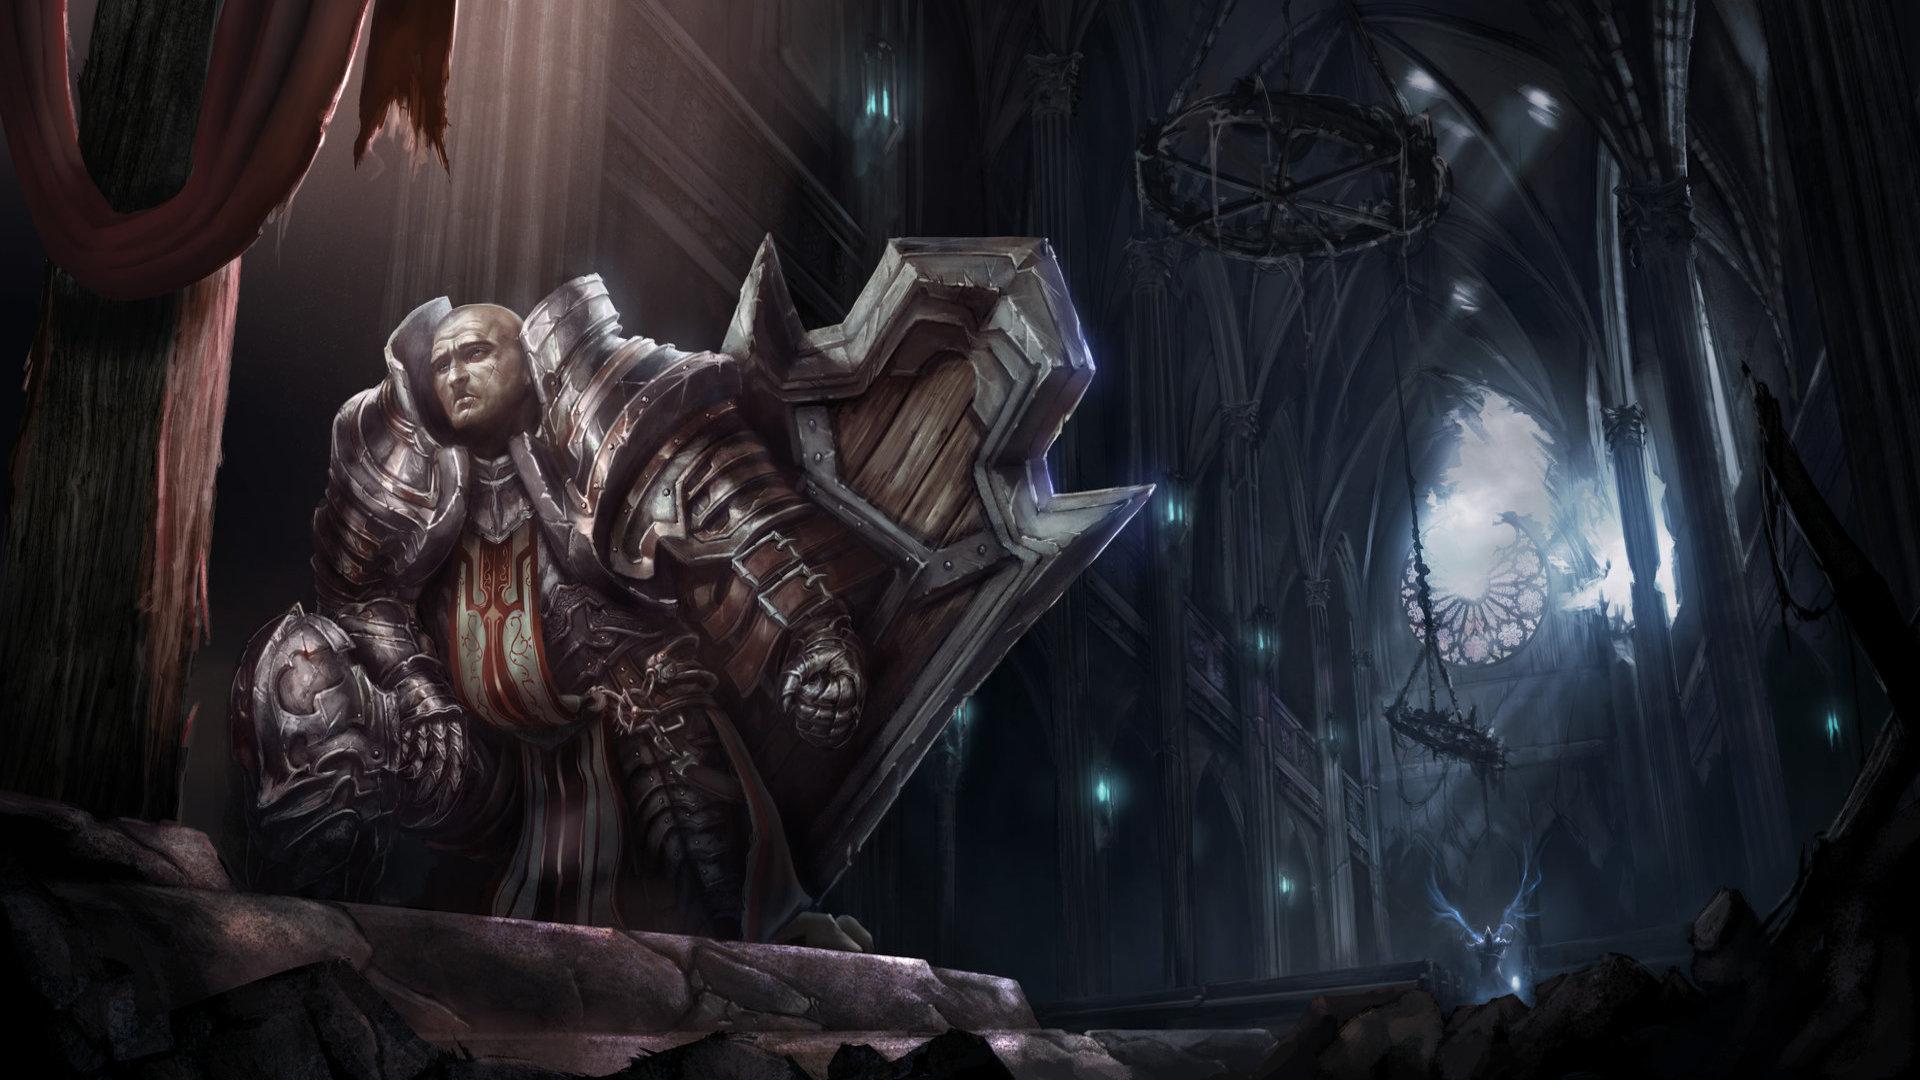 Armor Crusader Diablo Iii 1920x1080